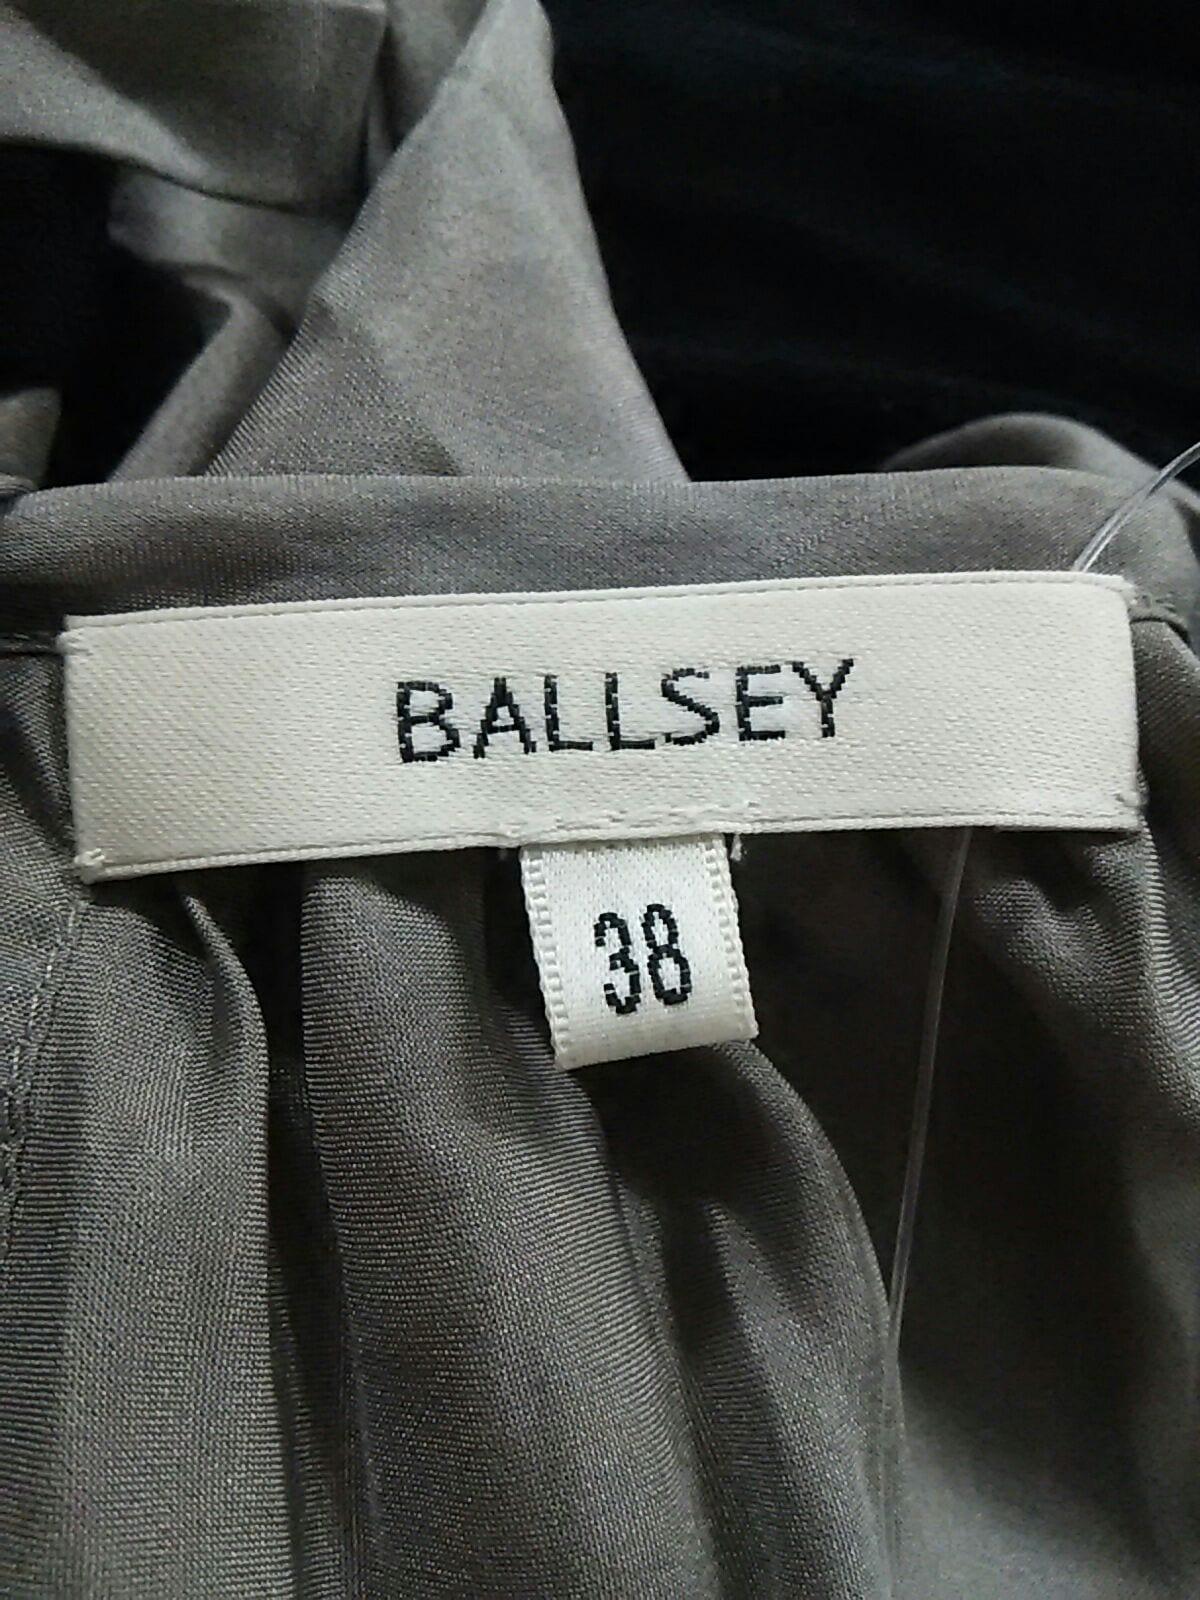 BALLSEY(ボールジー)のチュニック